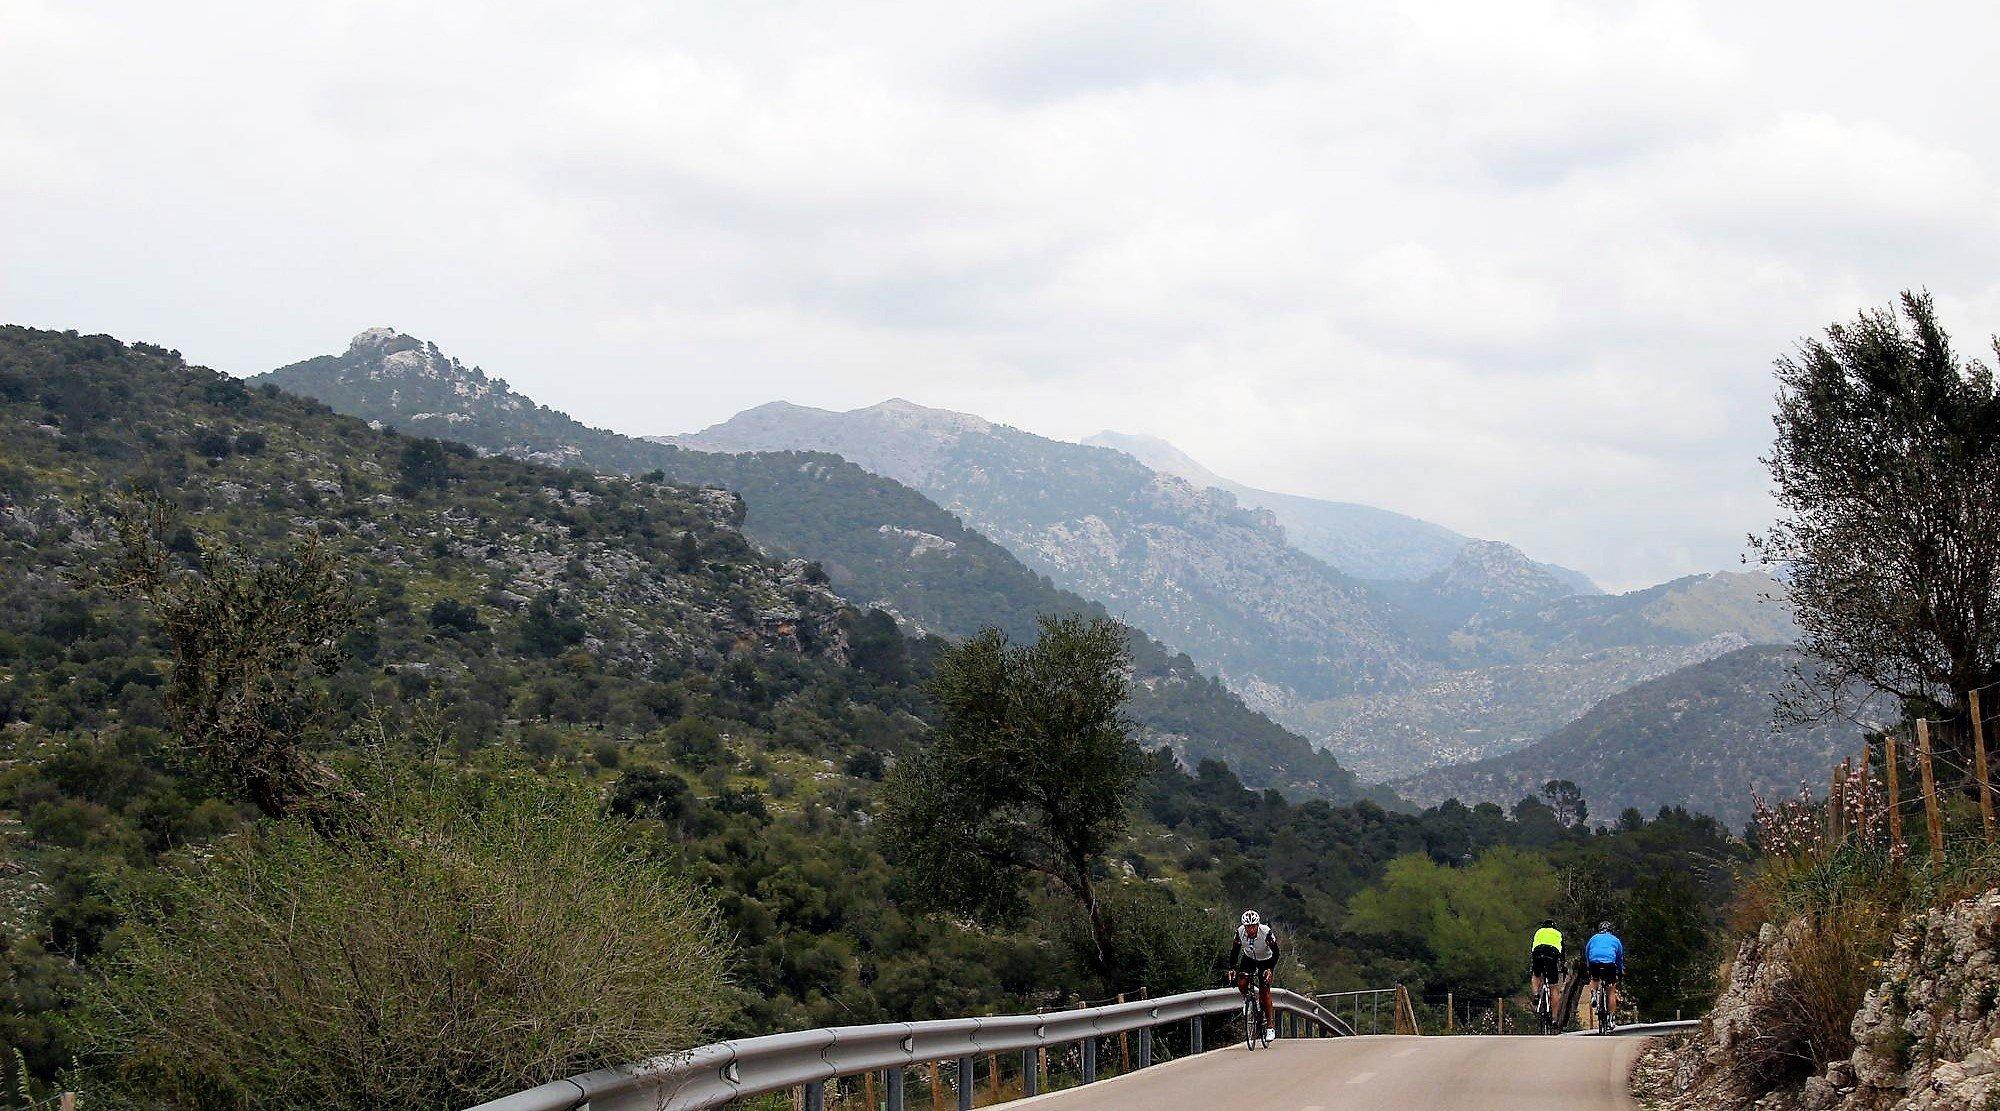 Serra de Tramuntana en bicicleta. Orient 3. BICIS EN RUTA. 1170x650